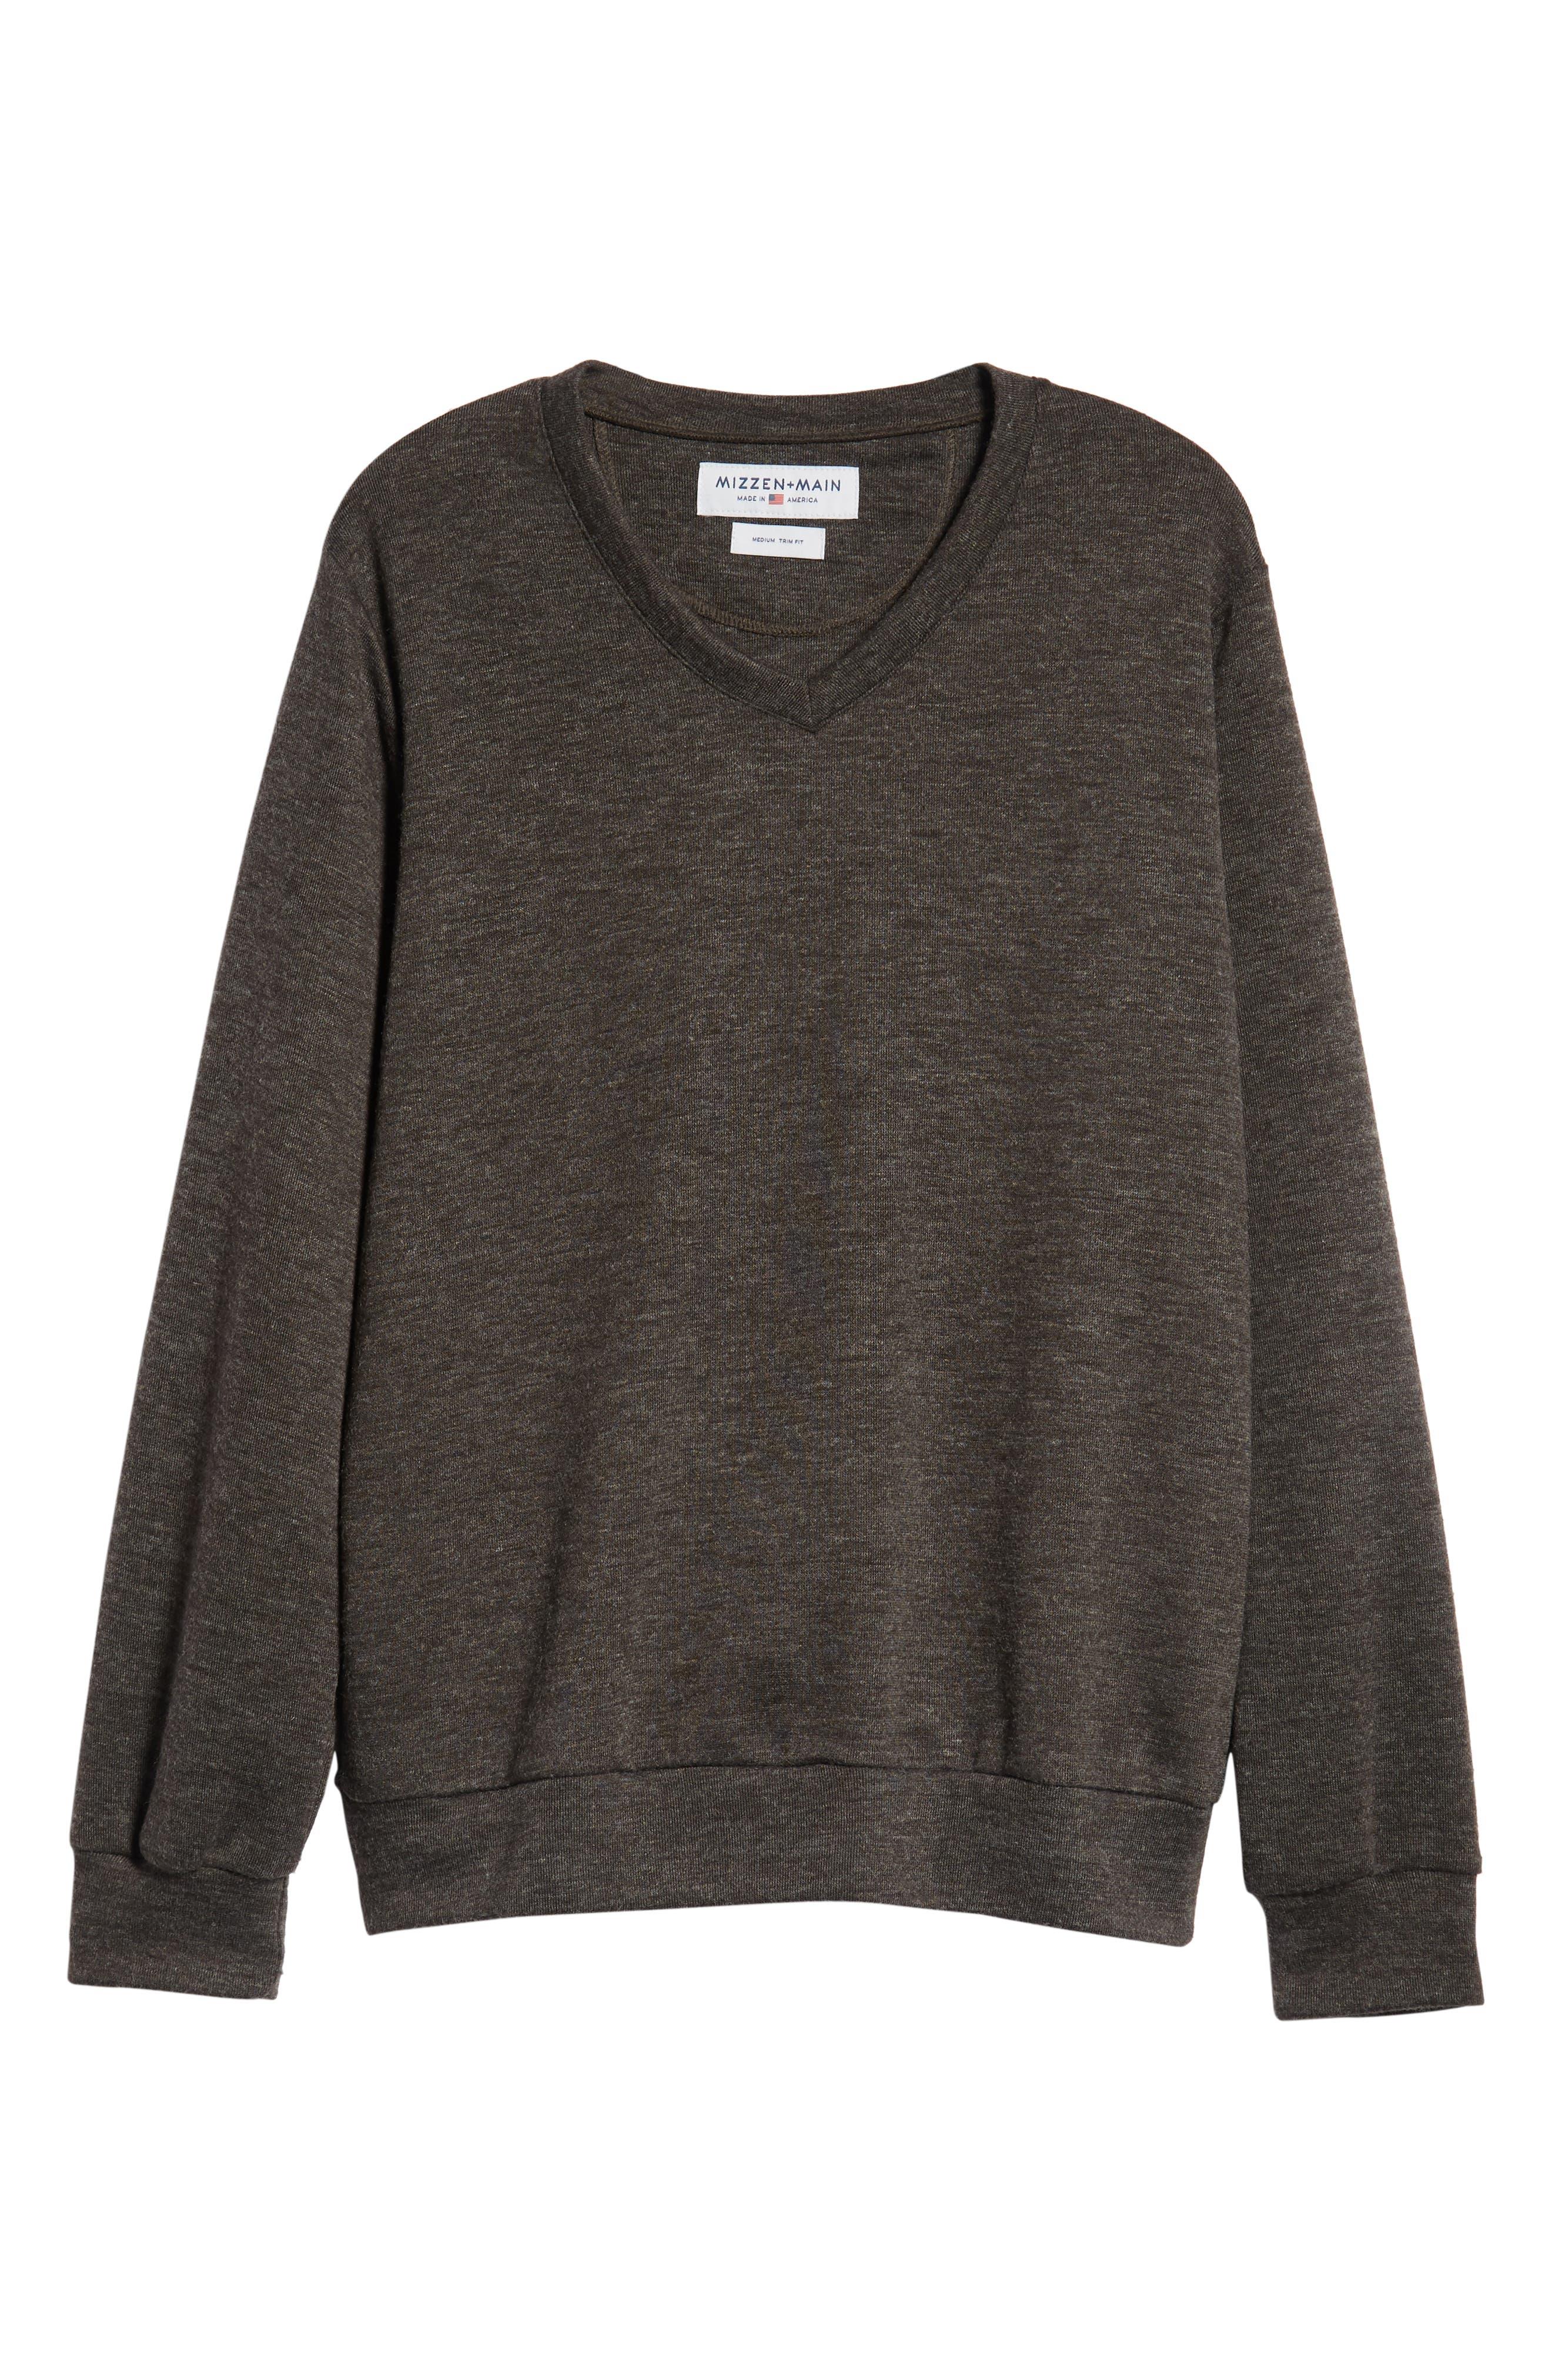 Prospect V-Neck Performance Sweater,                             Alternate thumbnail 6, color,                             CHARCOAL